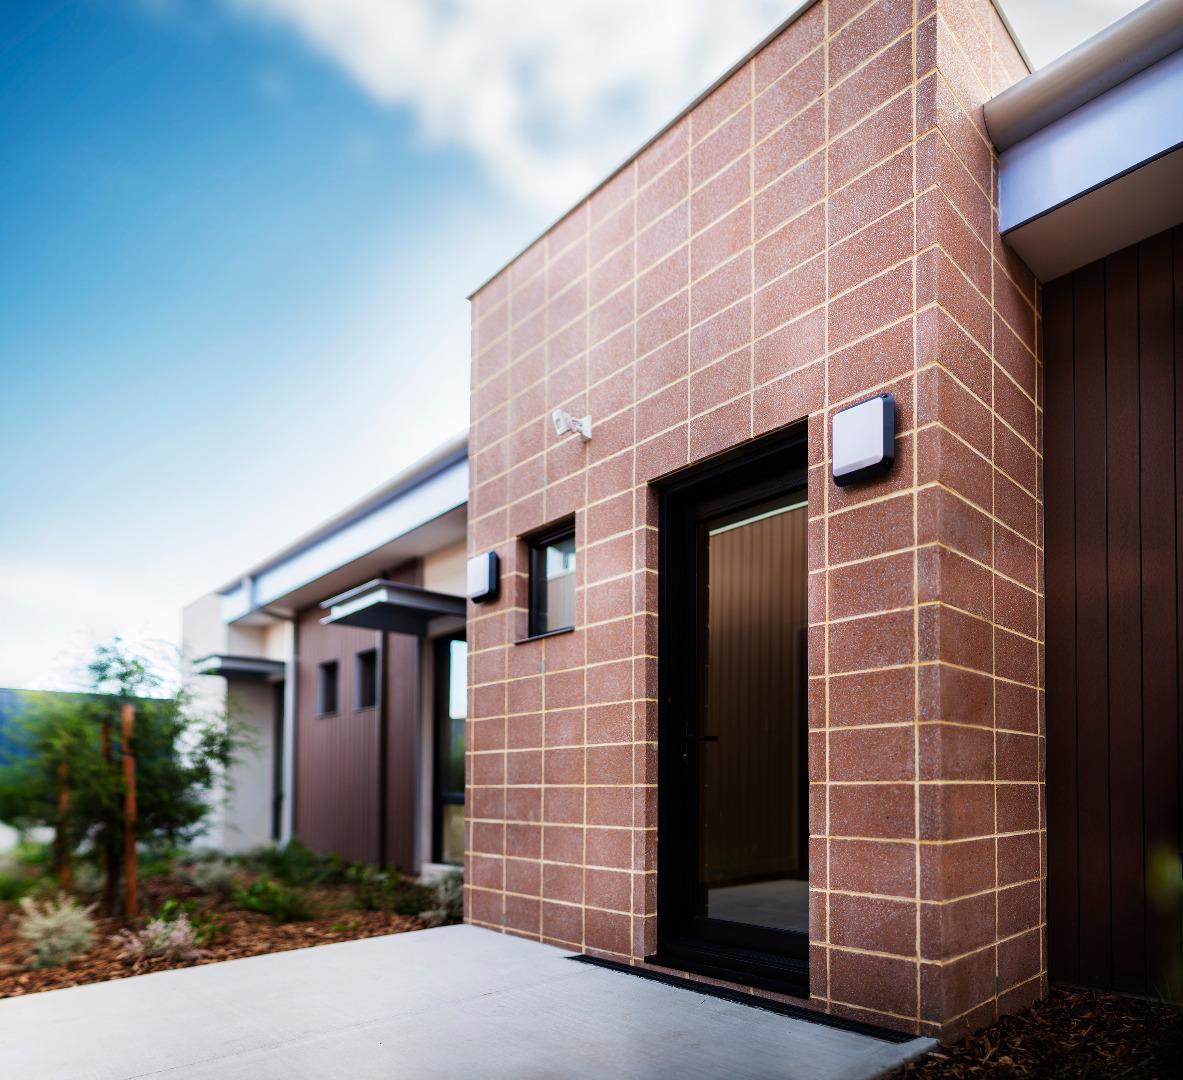 Christ Church Harbor Apartments: Think Brick Australia